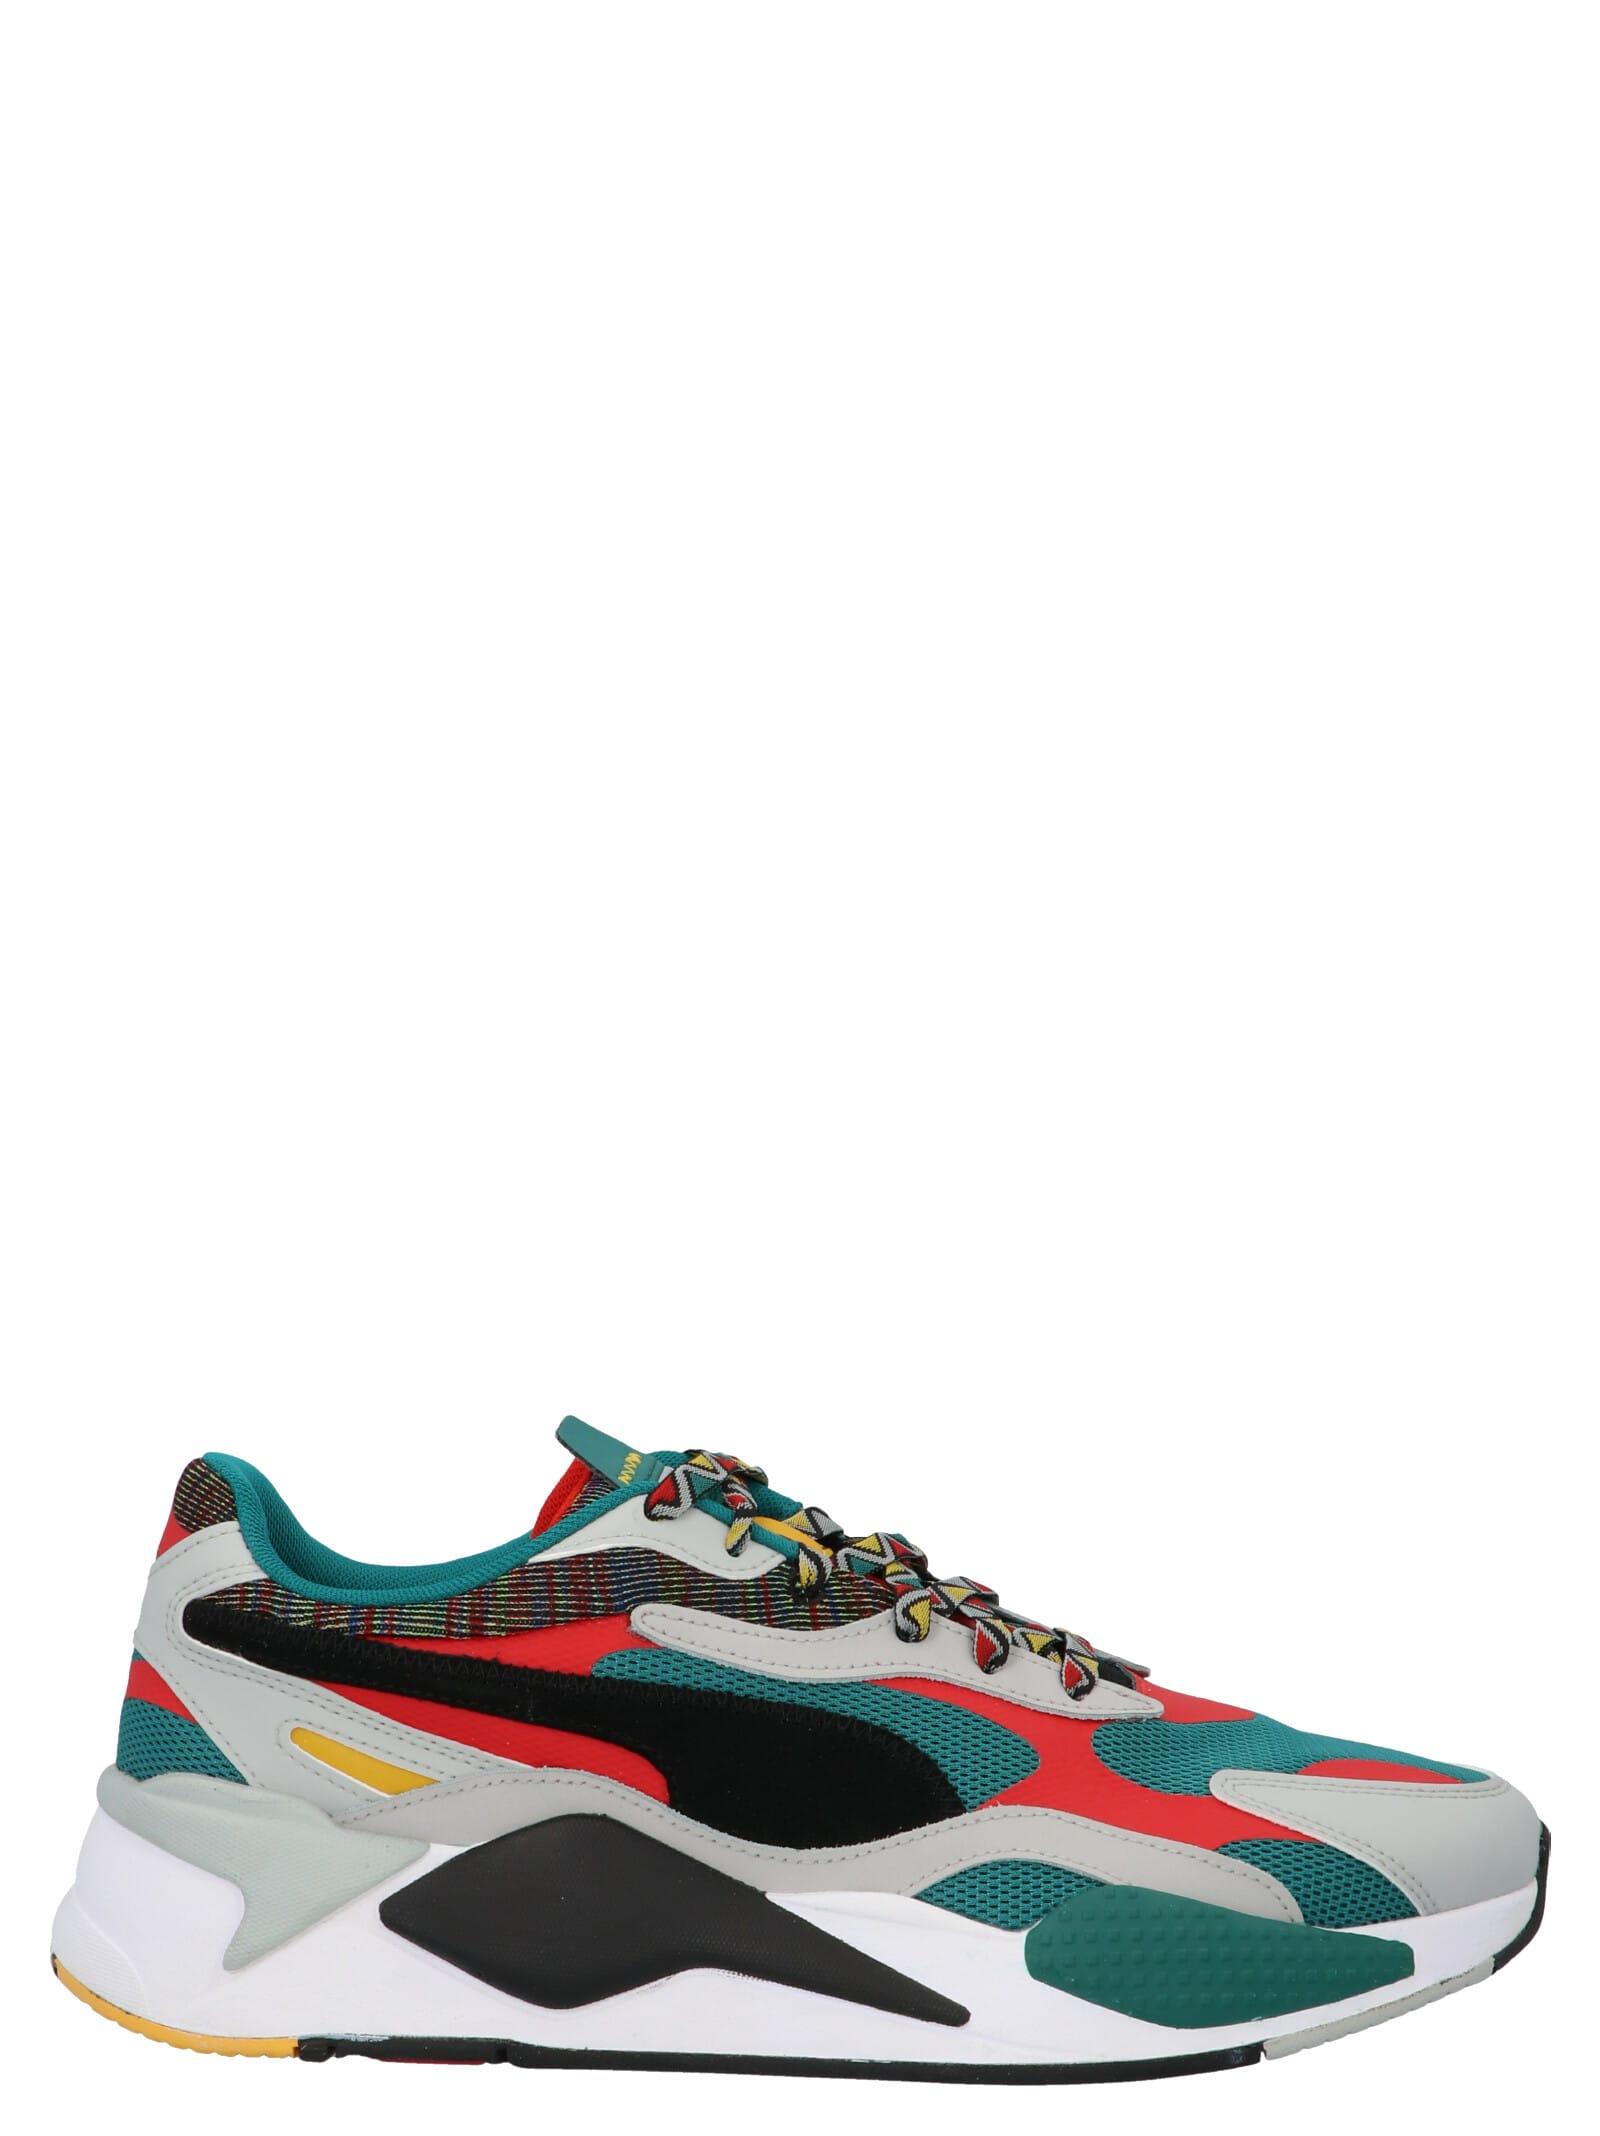 Puma rsx3 Afro Beat Shoes